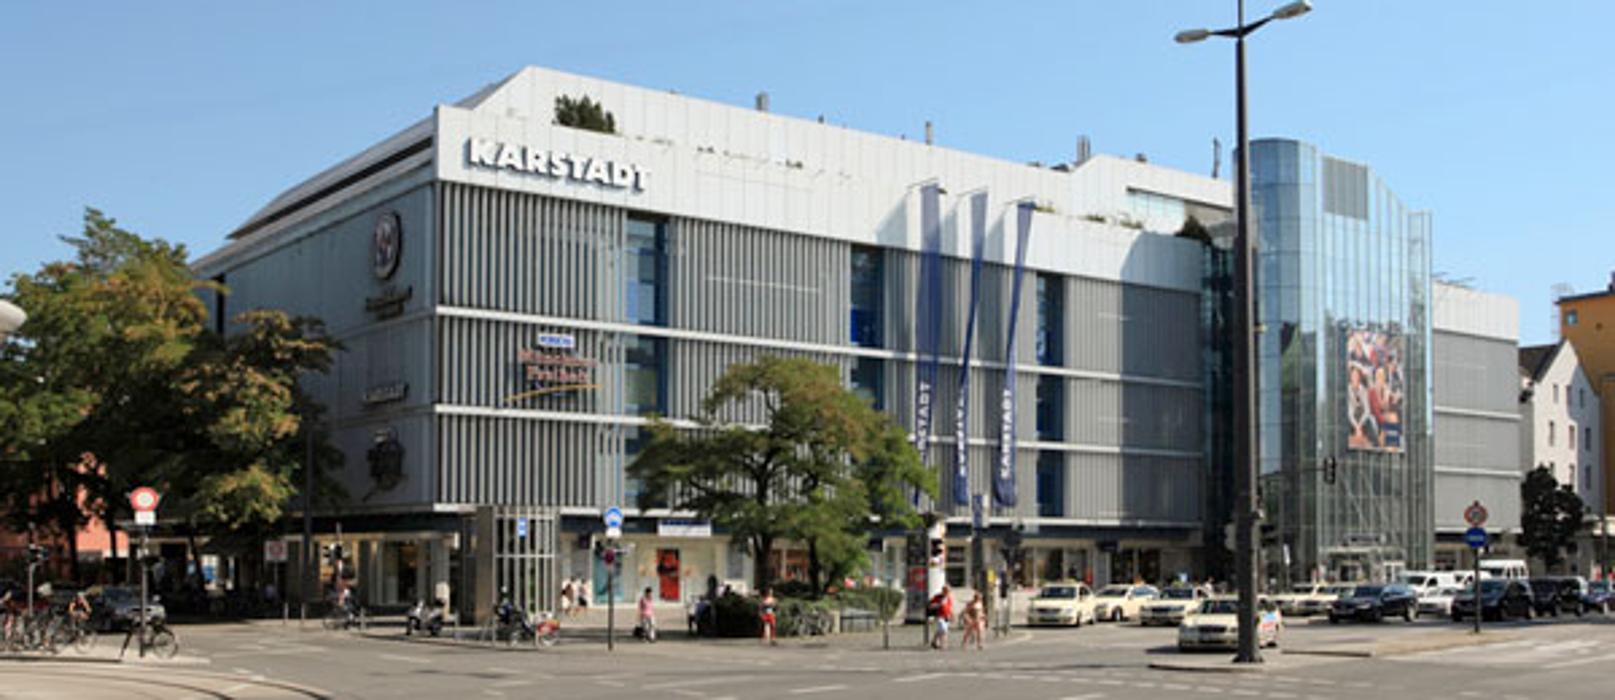 GALERIA (Karstadt) München Schwabing, Leopoldstraße in München